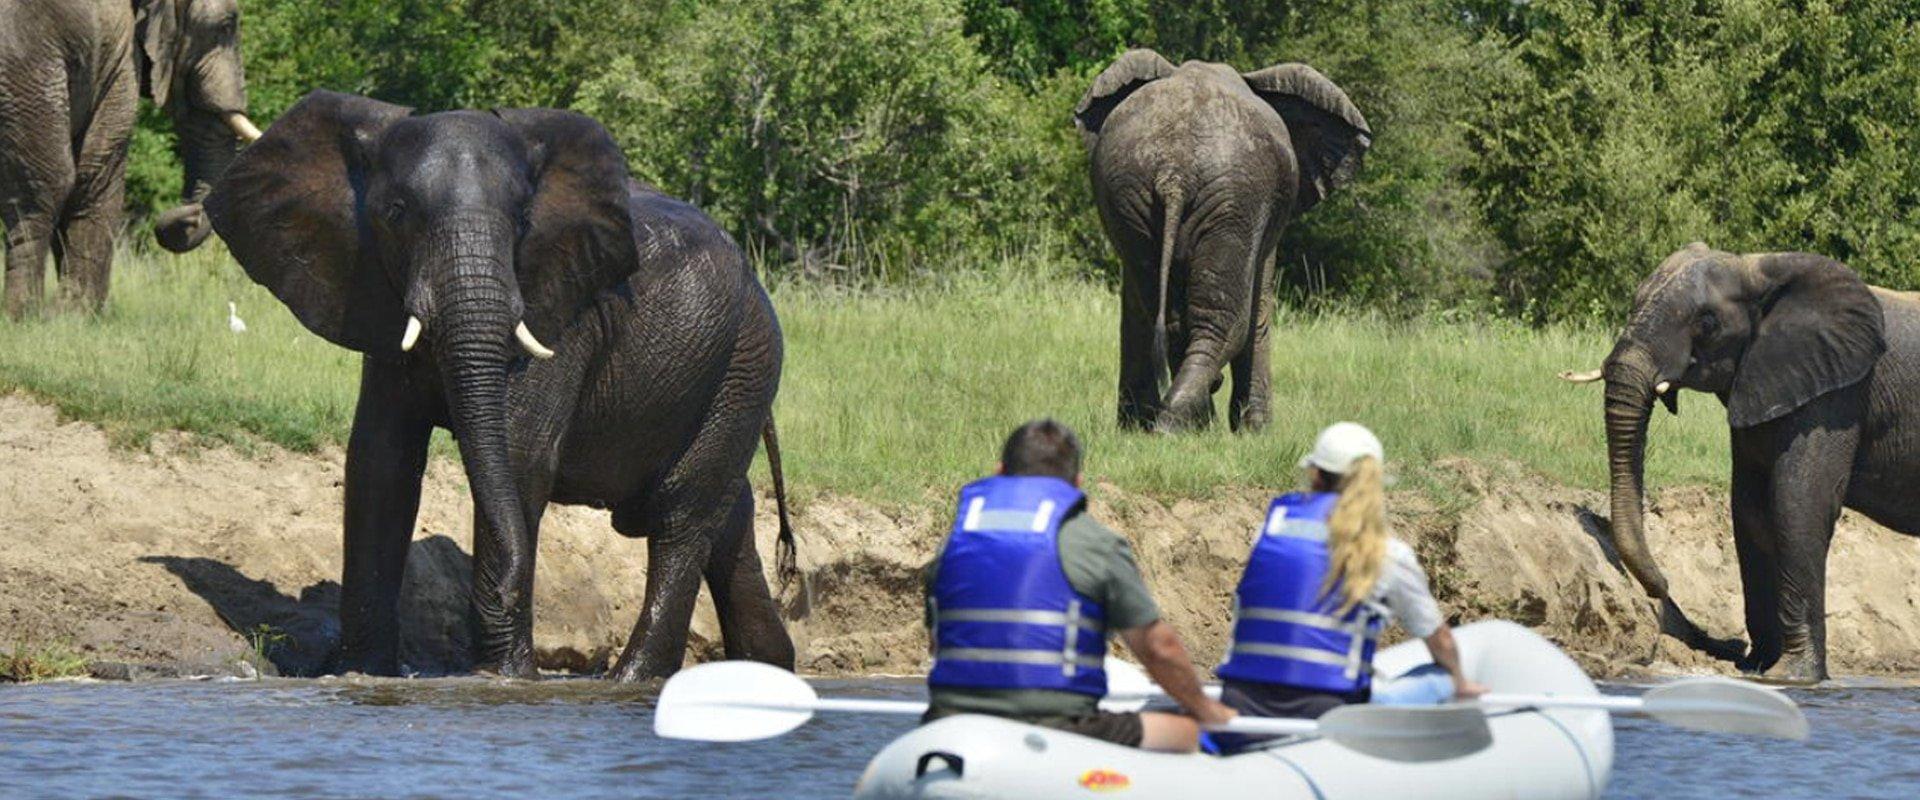 Take in the sites on a Zambezi Canoe Safari